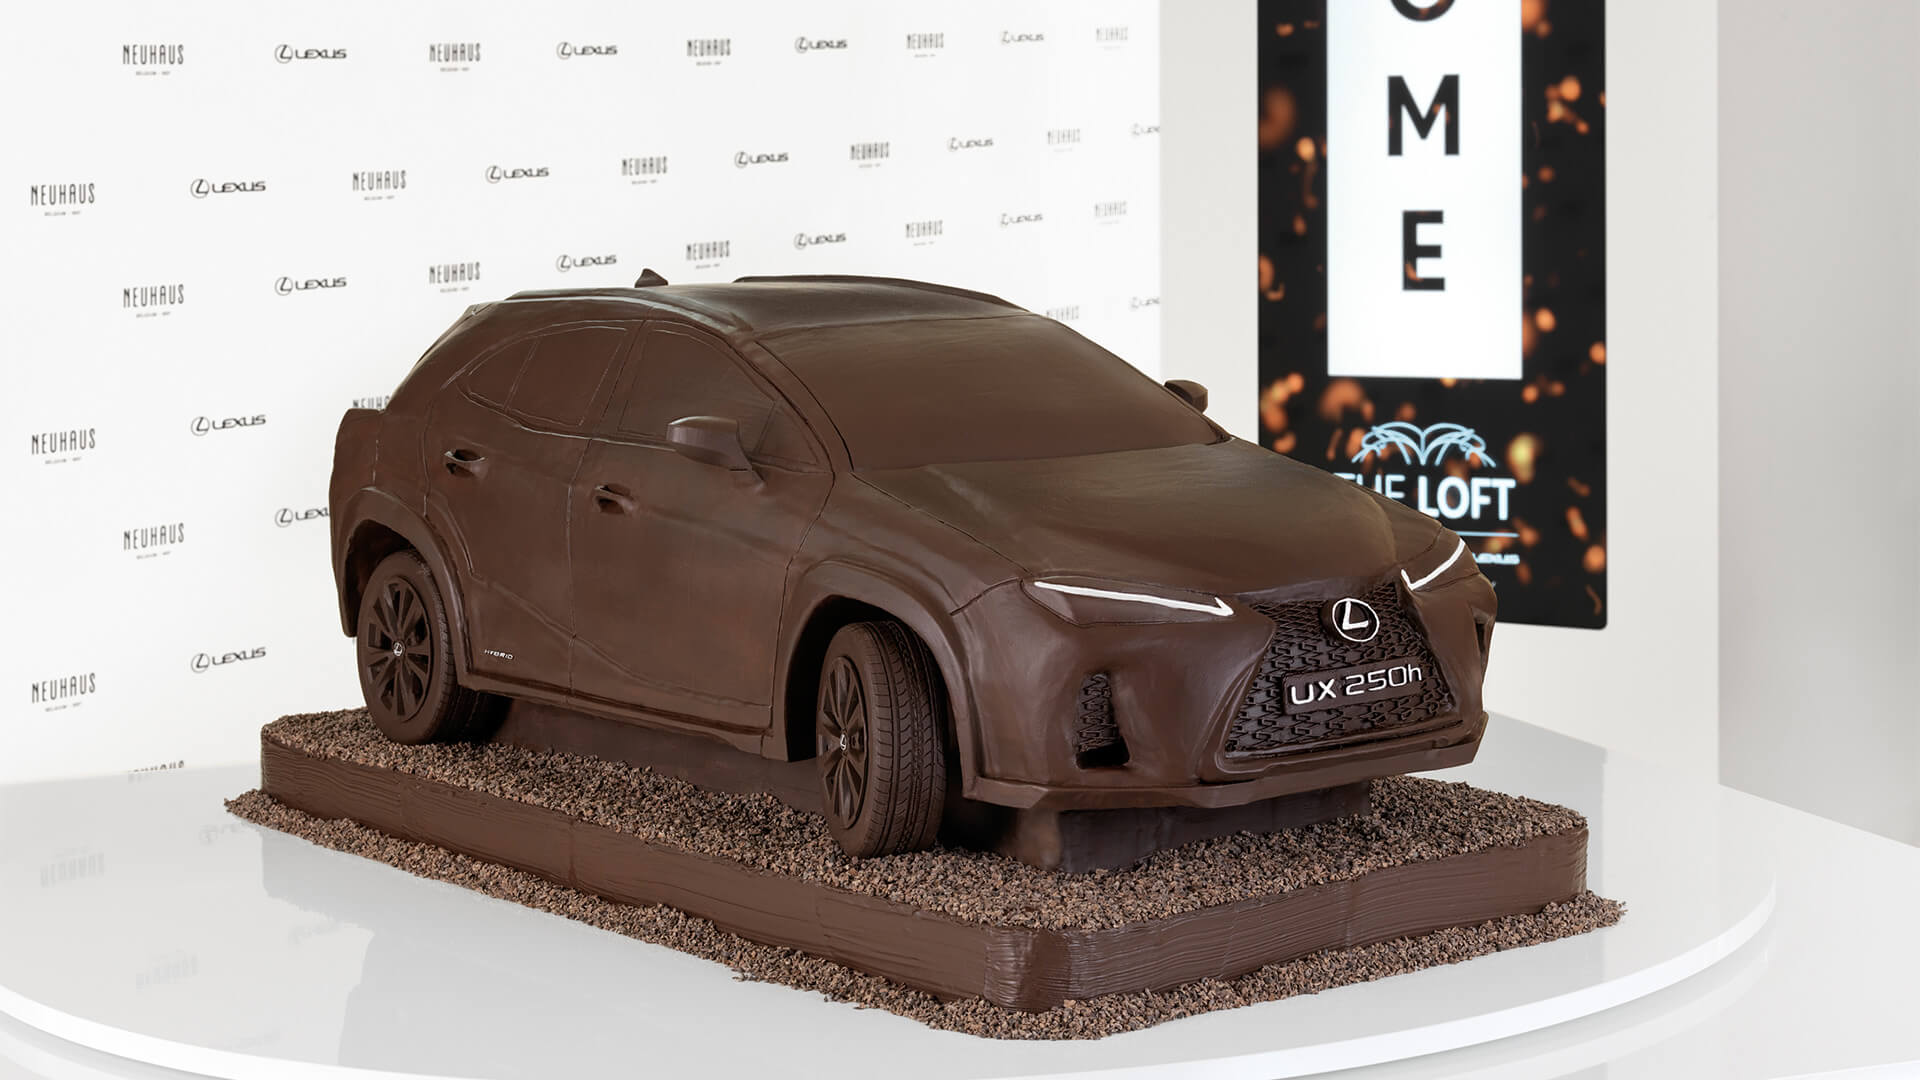 2019 lexus lounge UX Chocolate Car 1920x1080 01